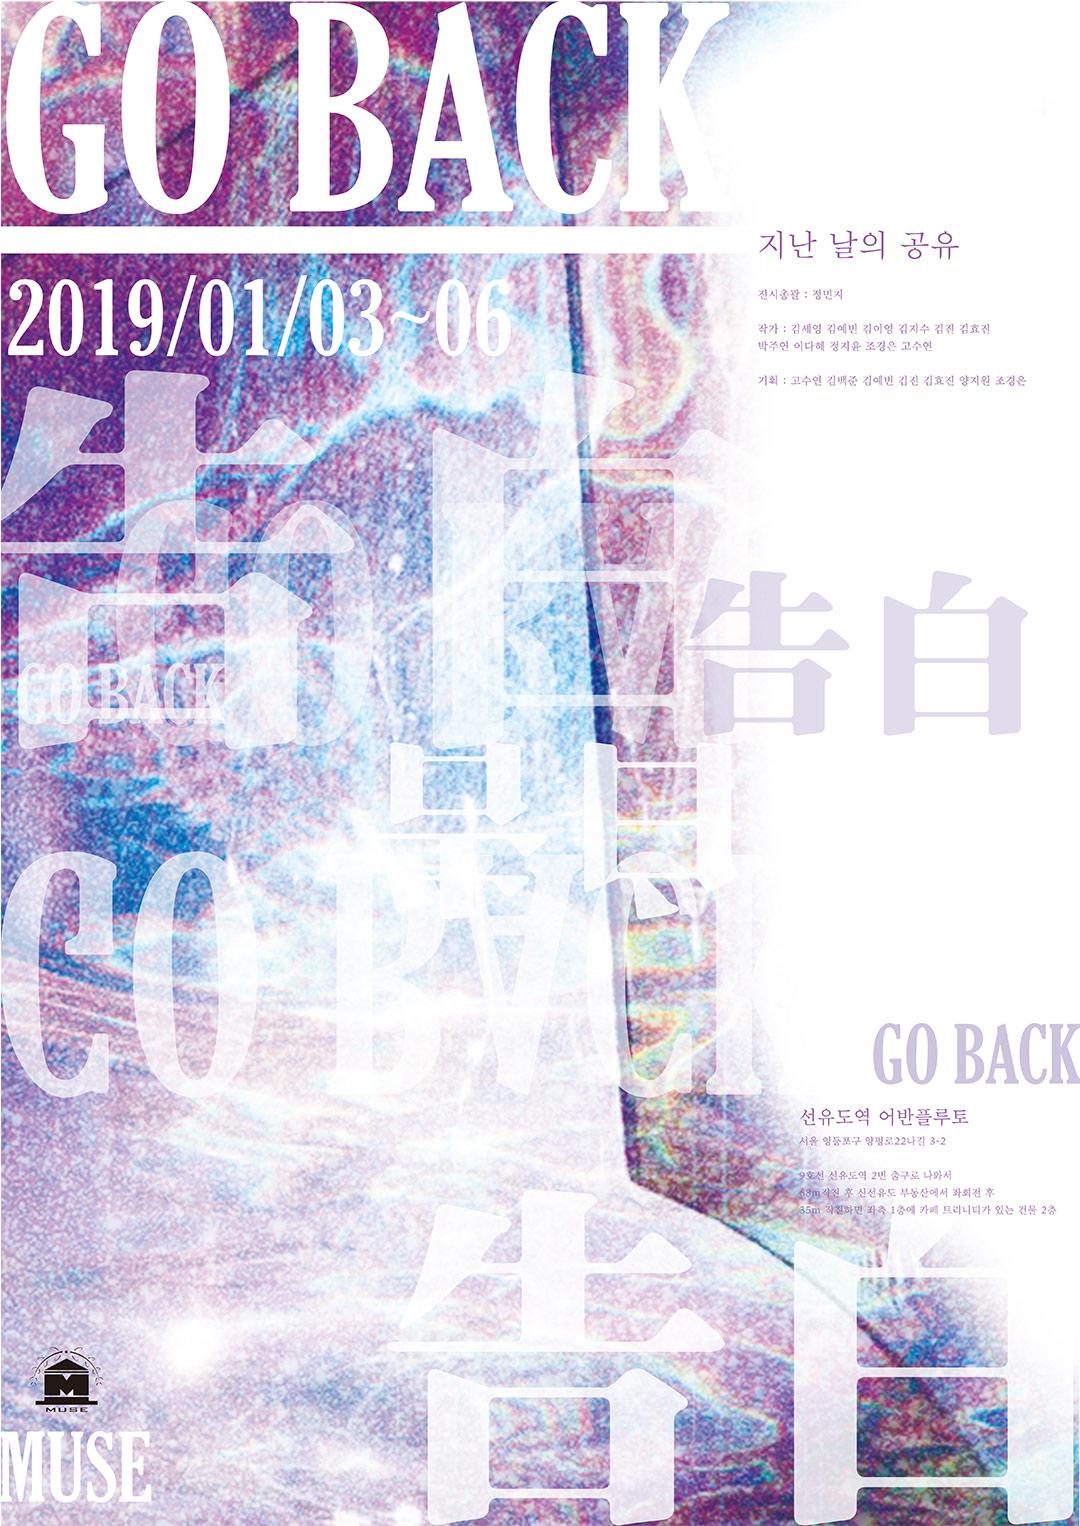 GO BACK : 지난 날의 공유 - MUSE(중앙대학교 종합예술동아리) 무료전시 포스터